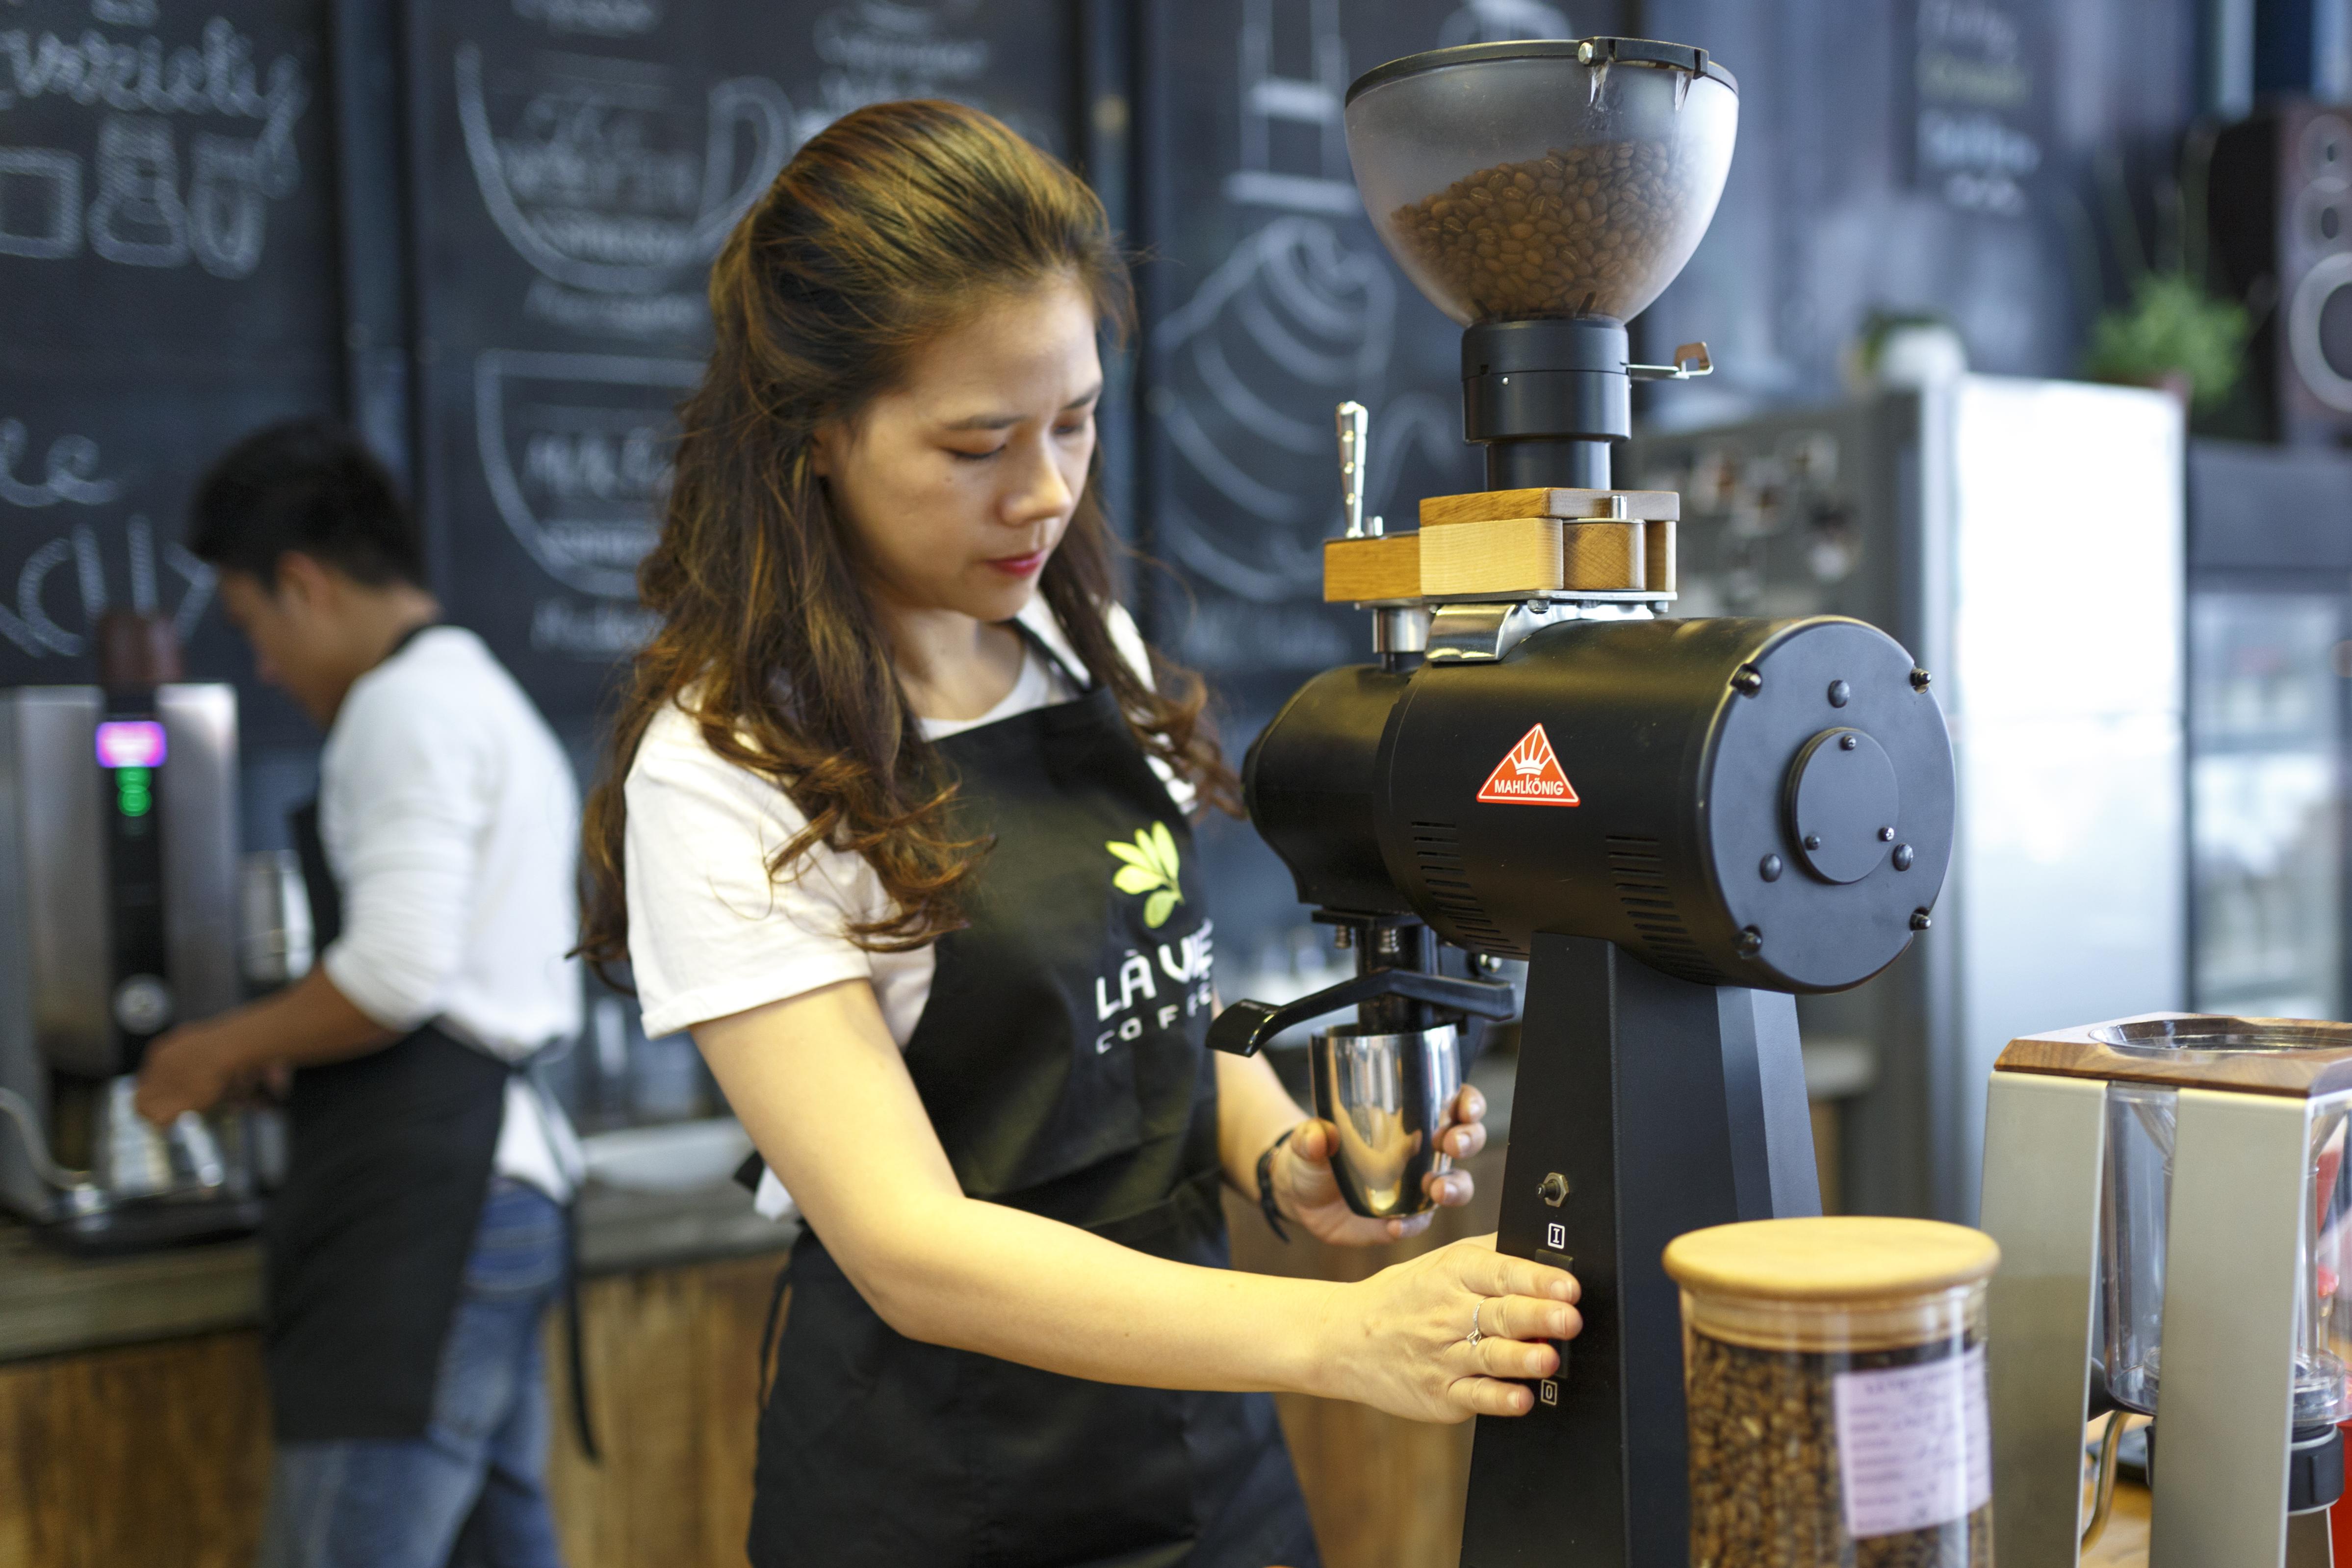 Woman Grinding Coffee Bean